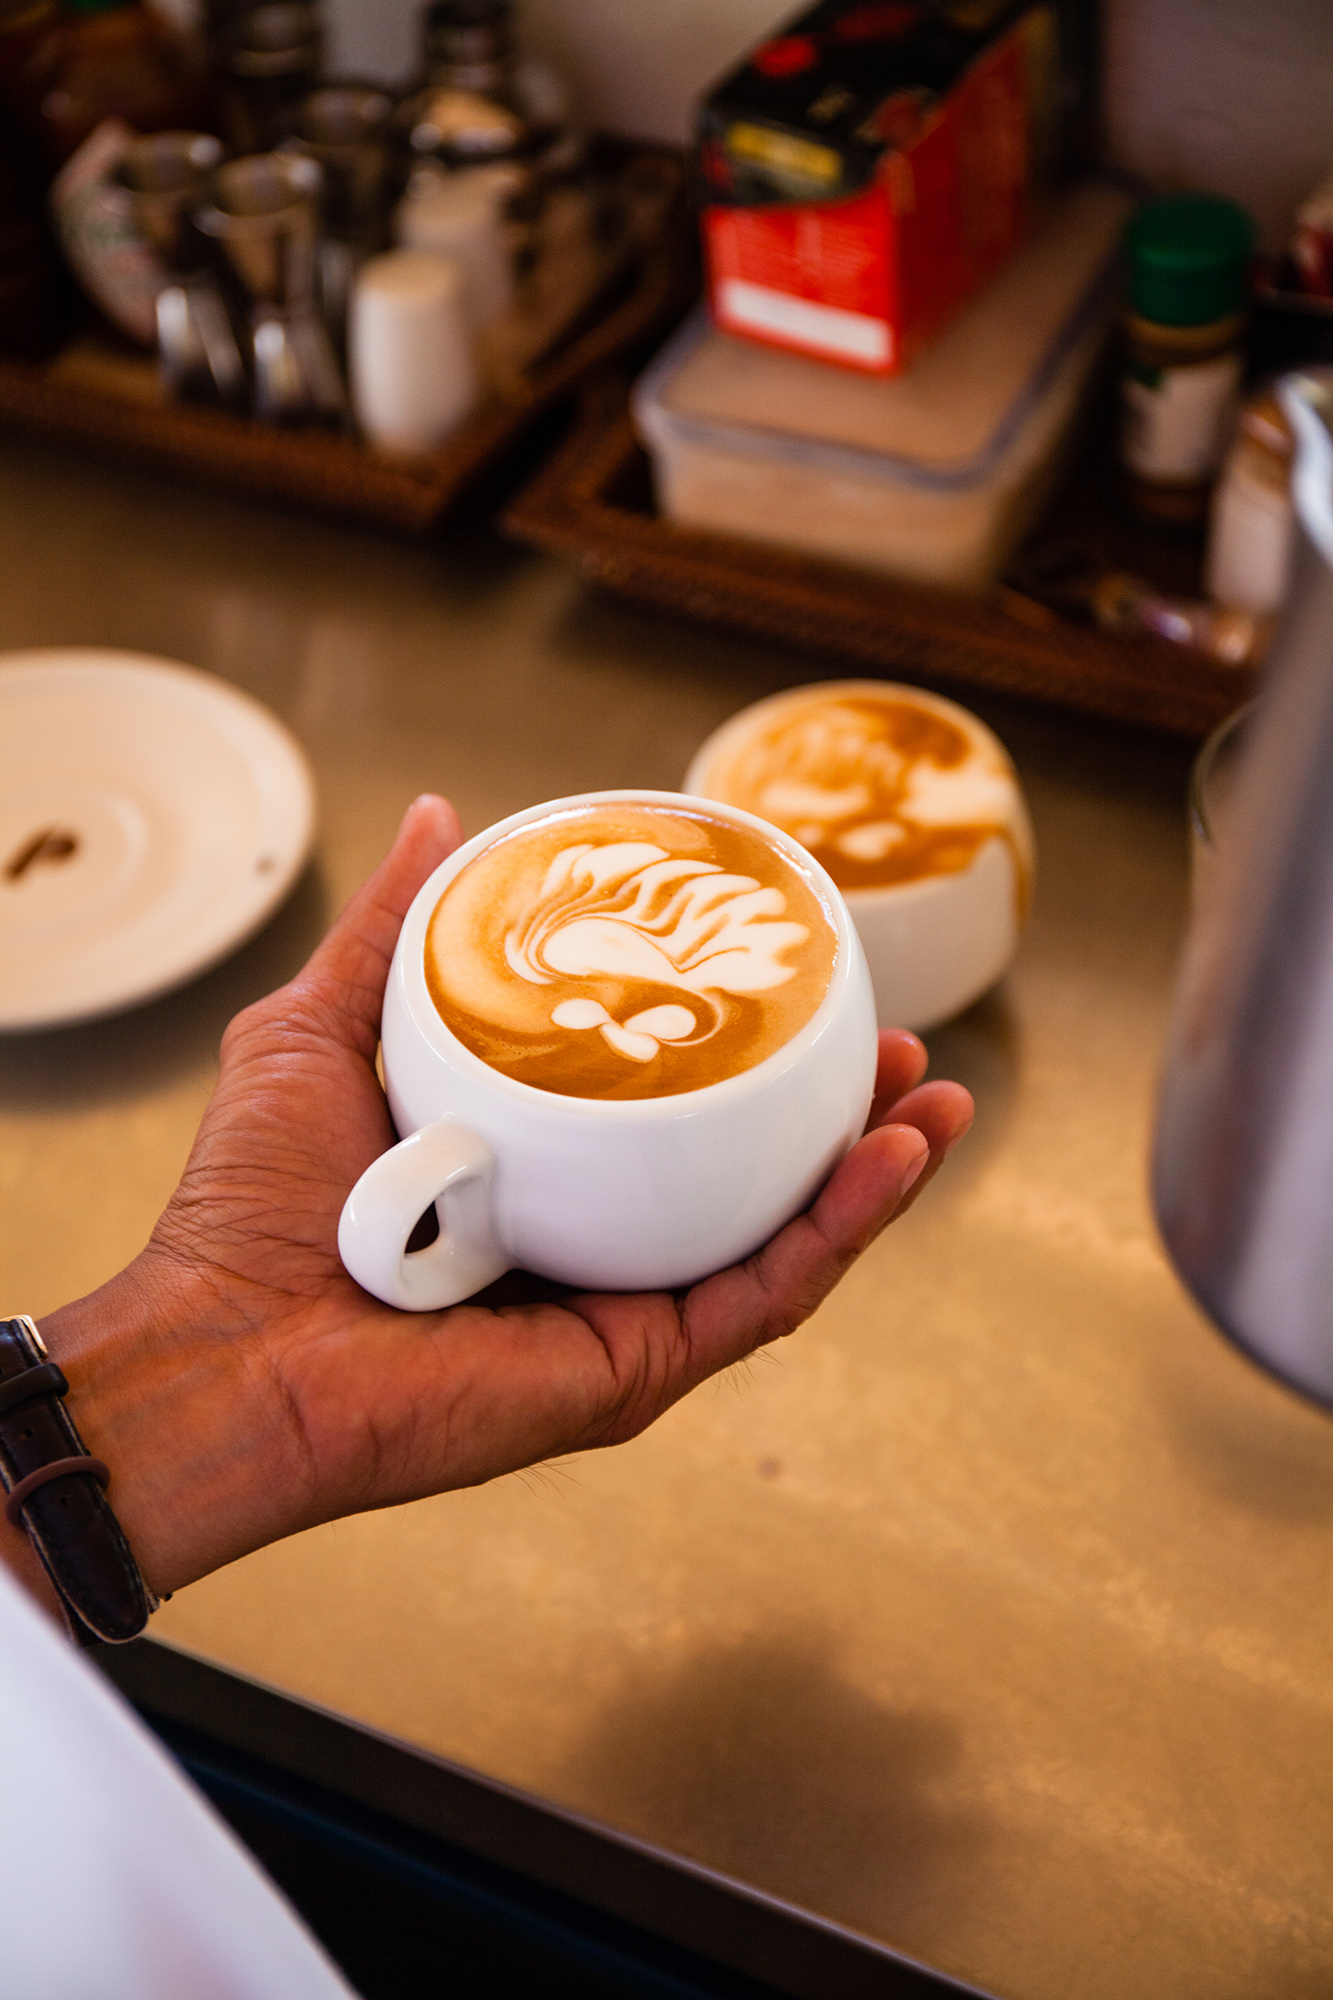 Caffe lattes